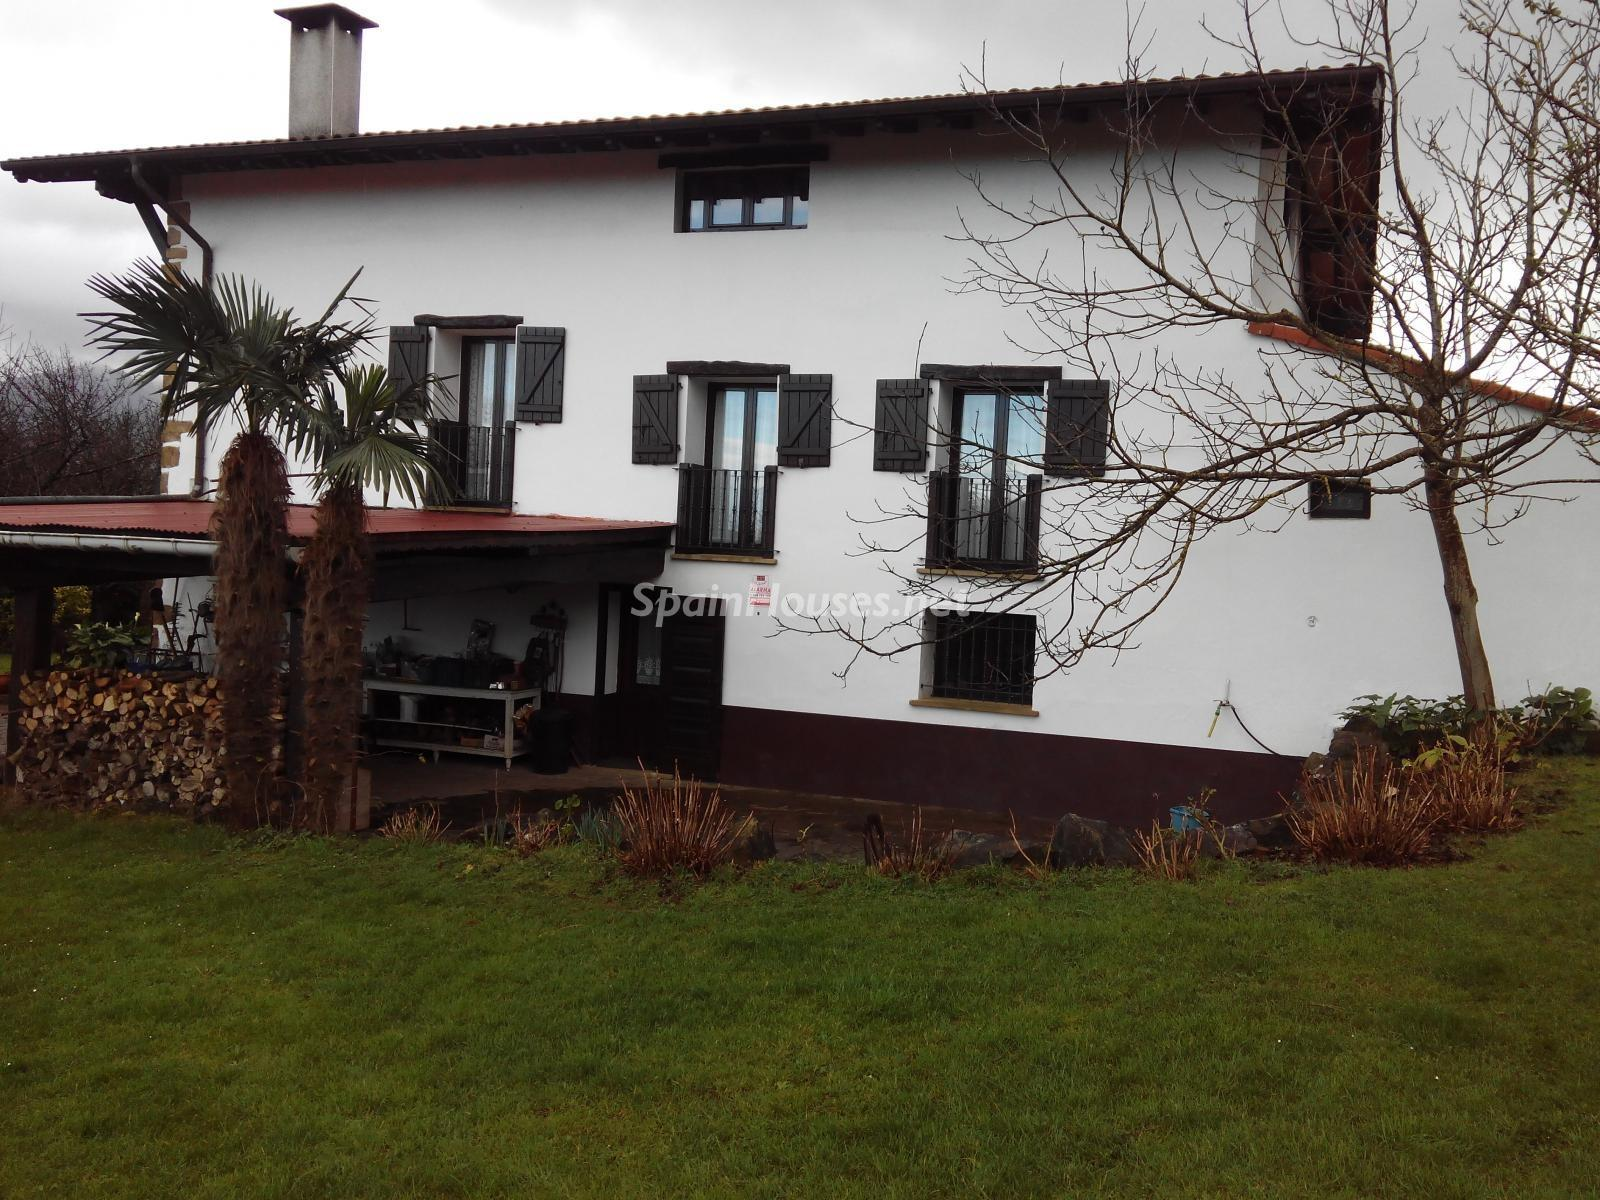 4. House for sale in Hondarribia Guipúzcoa - Charming Country House in Hondarribia, Guipúzcoa